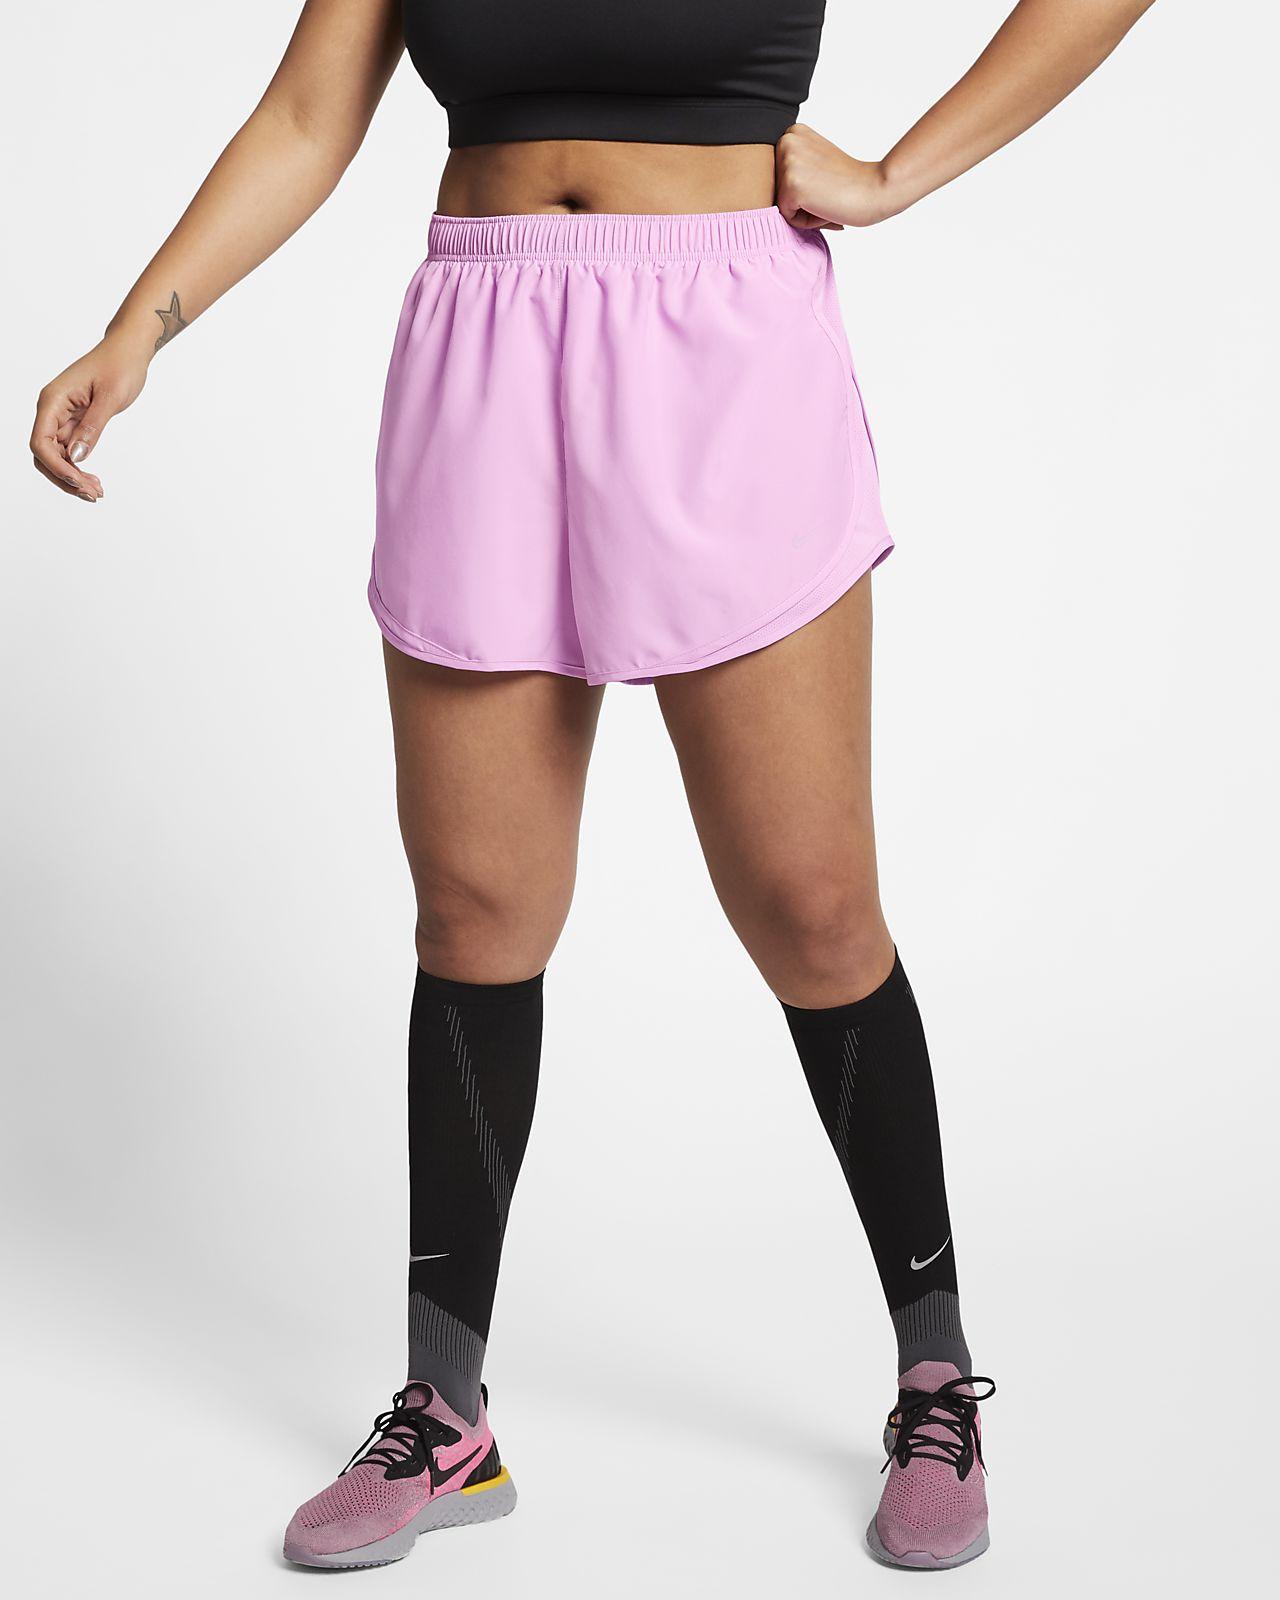 27f527814e2 Nike Tempo (Plus Size) Women s 3